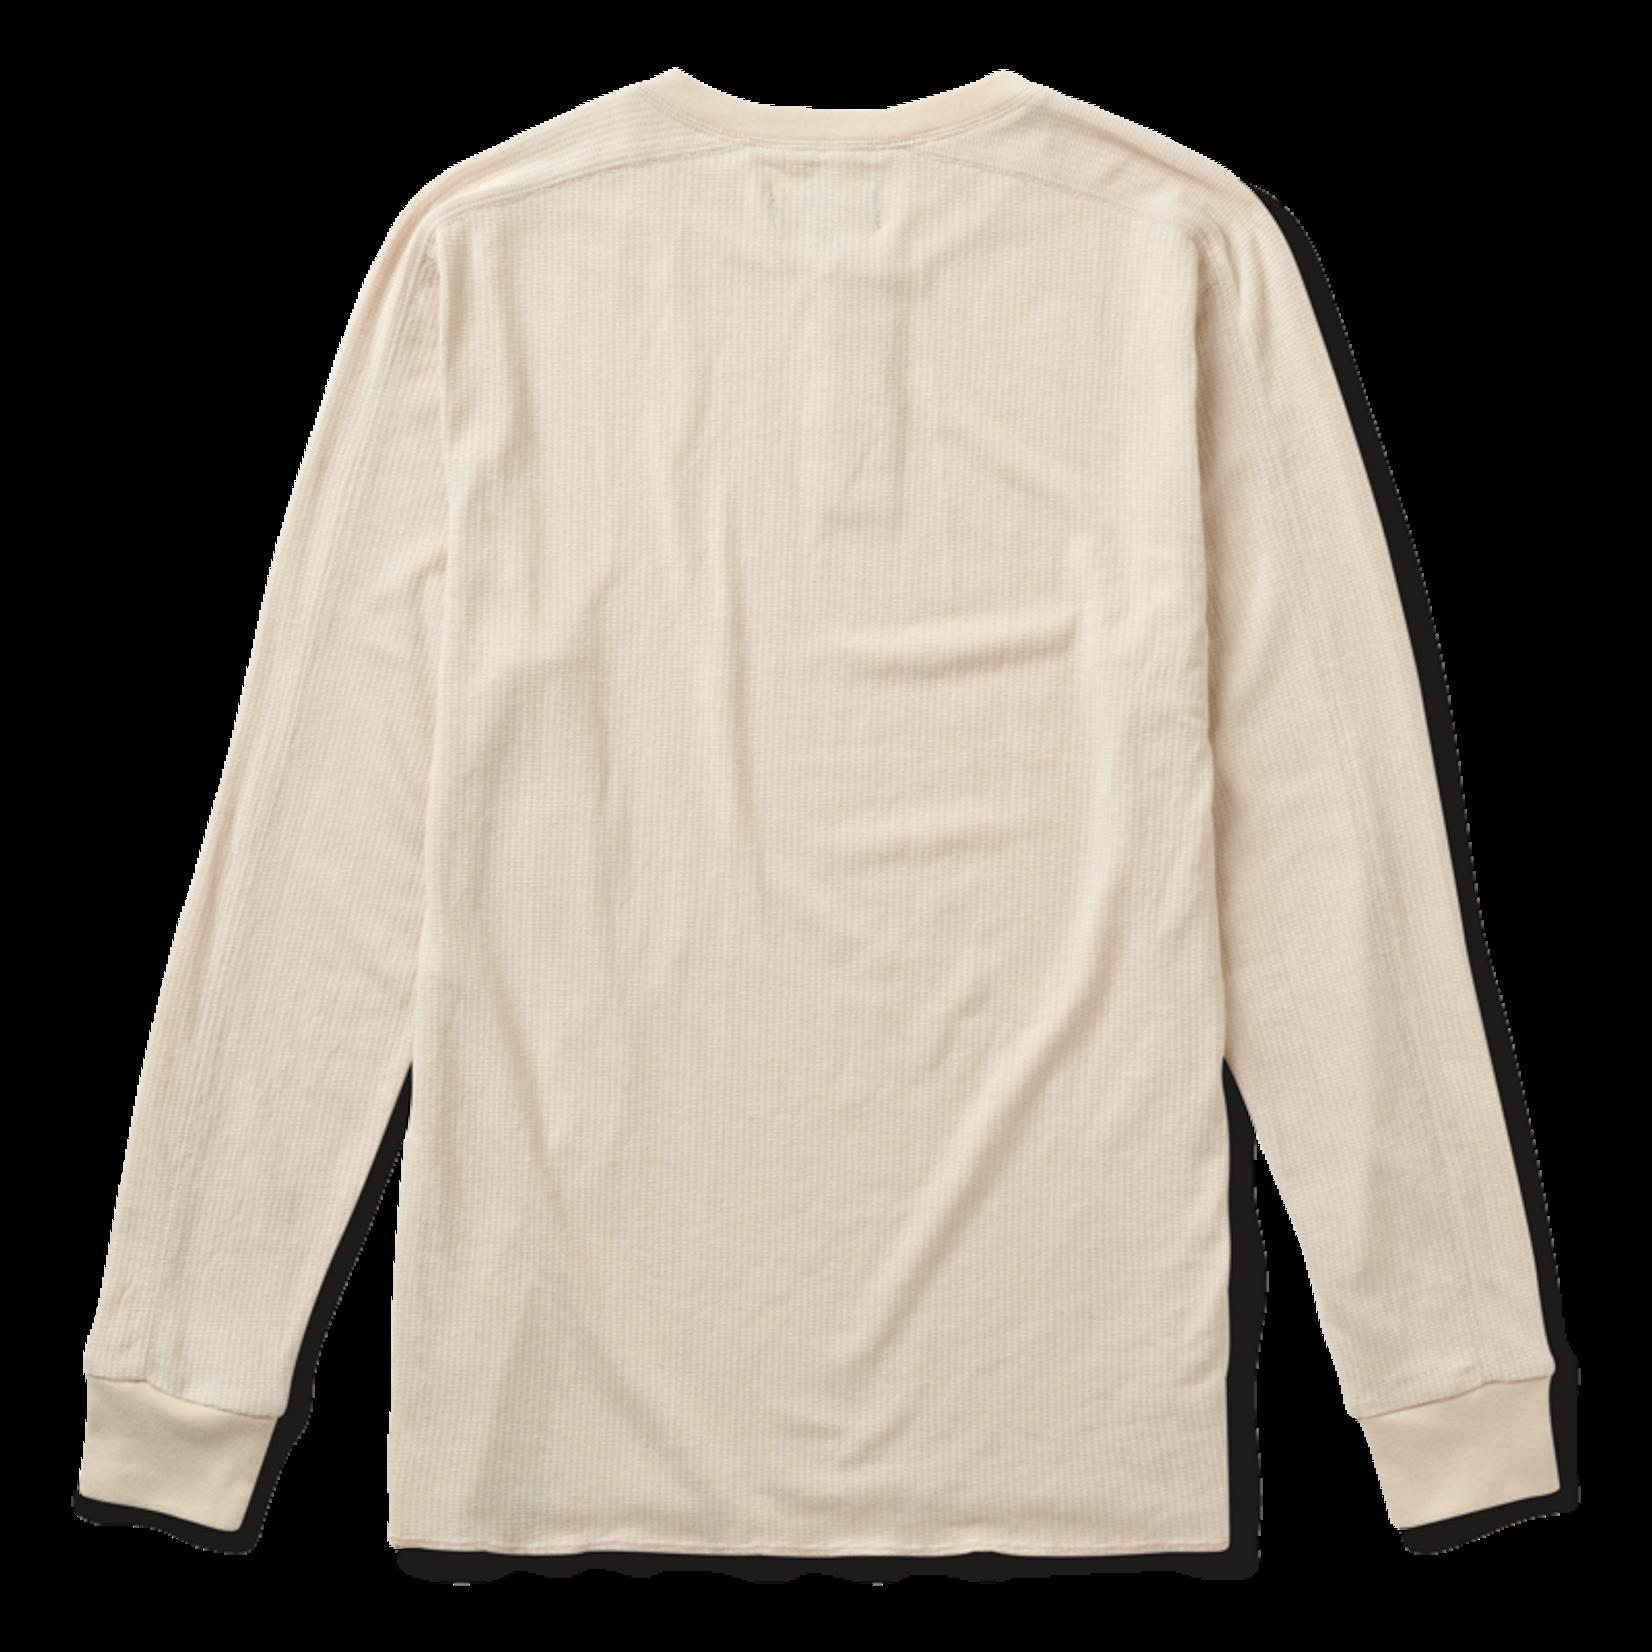 Roark Roark Range Rat Shirt